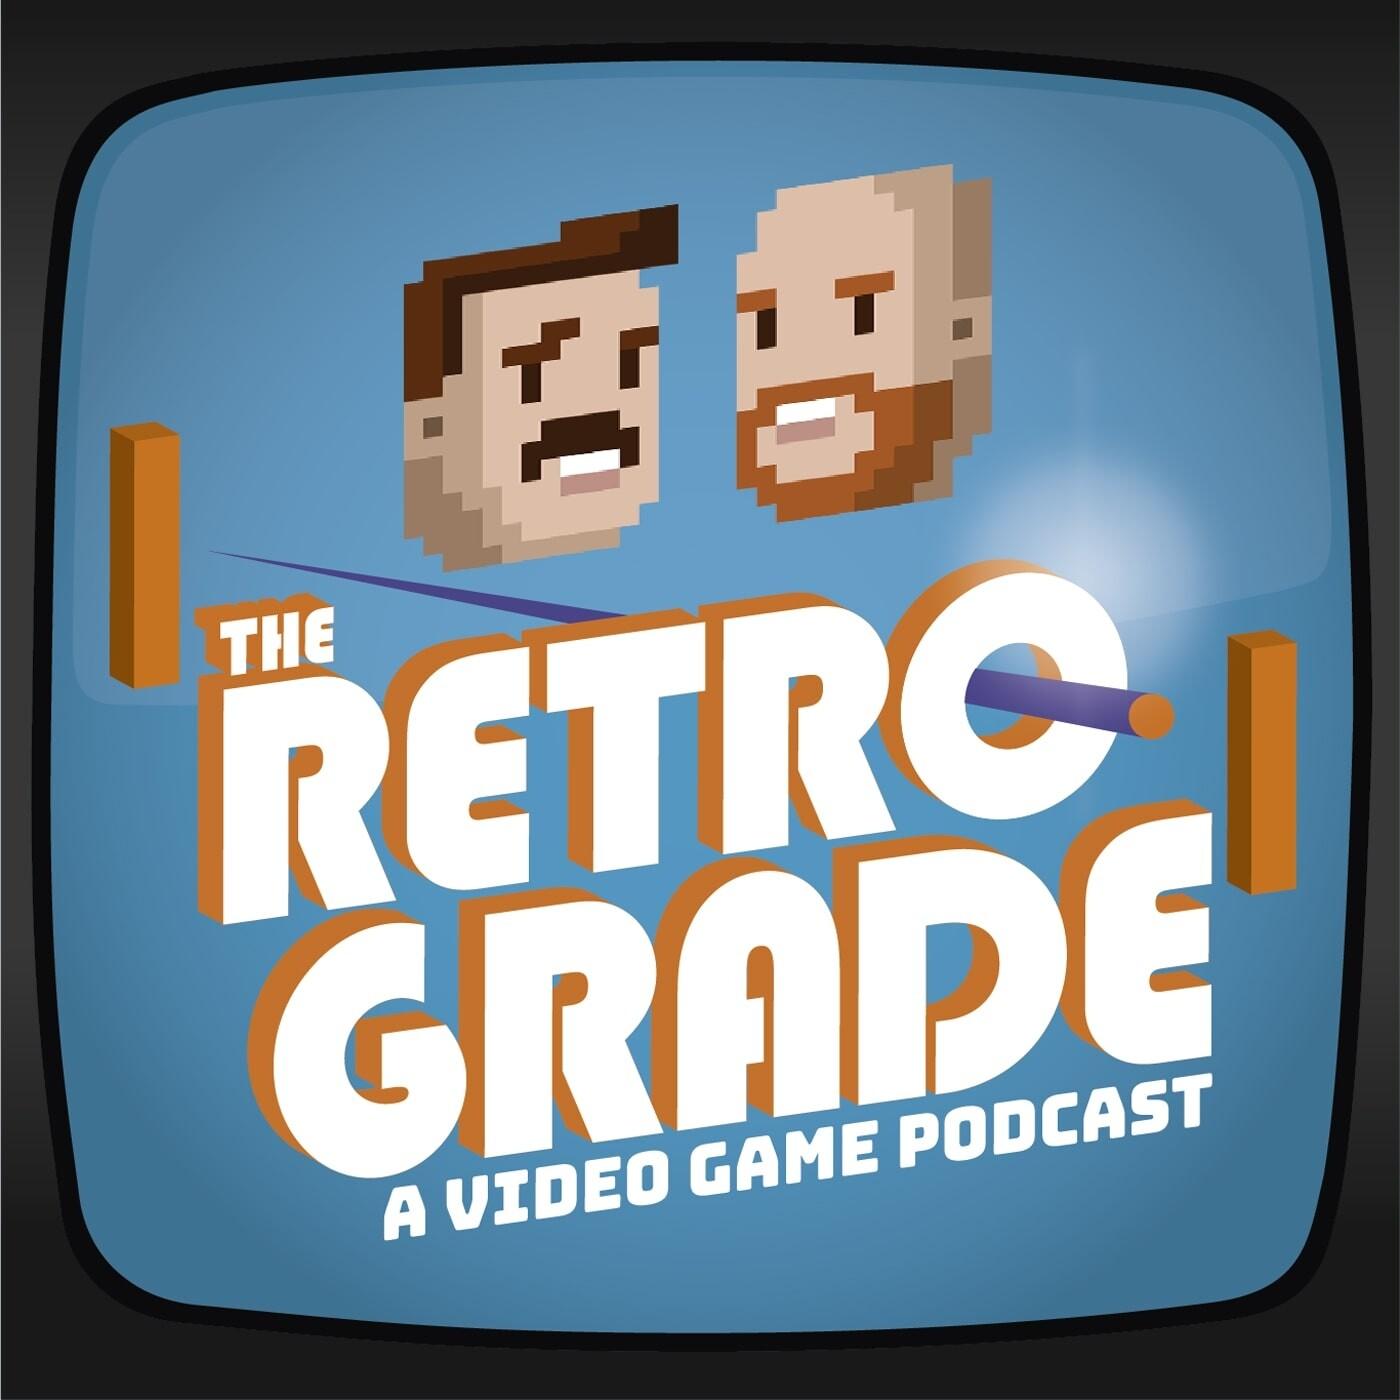 Episode 129: Condemned Criminal Origins - #RetroGrave